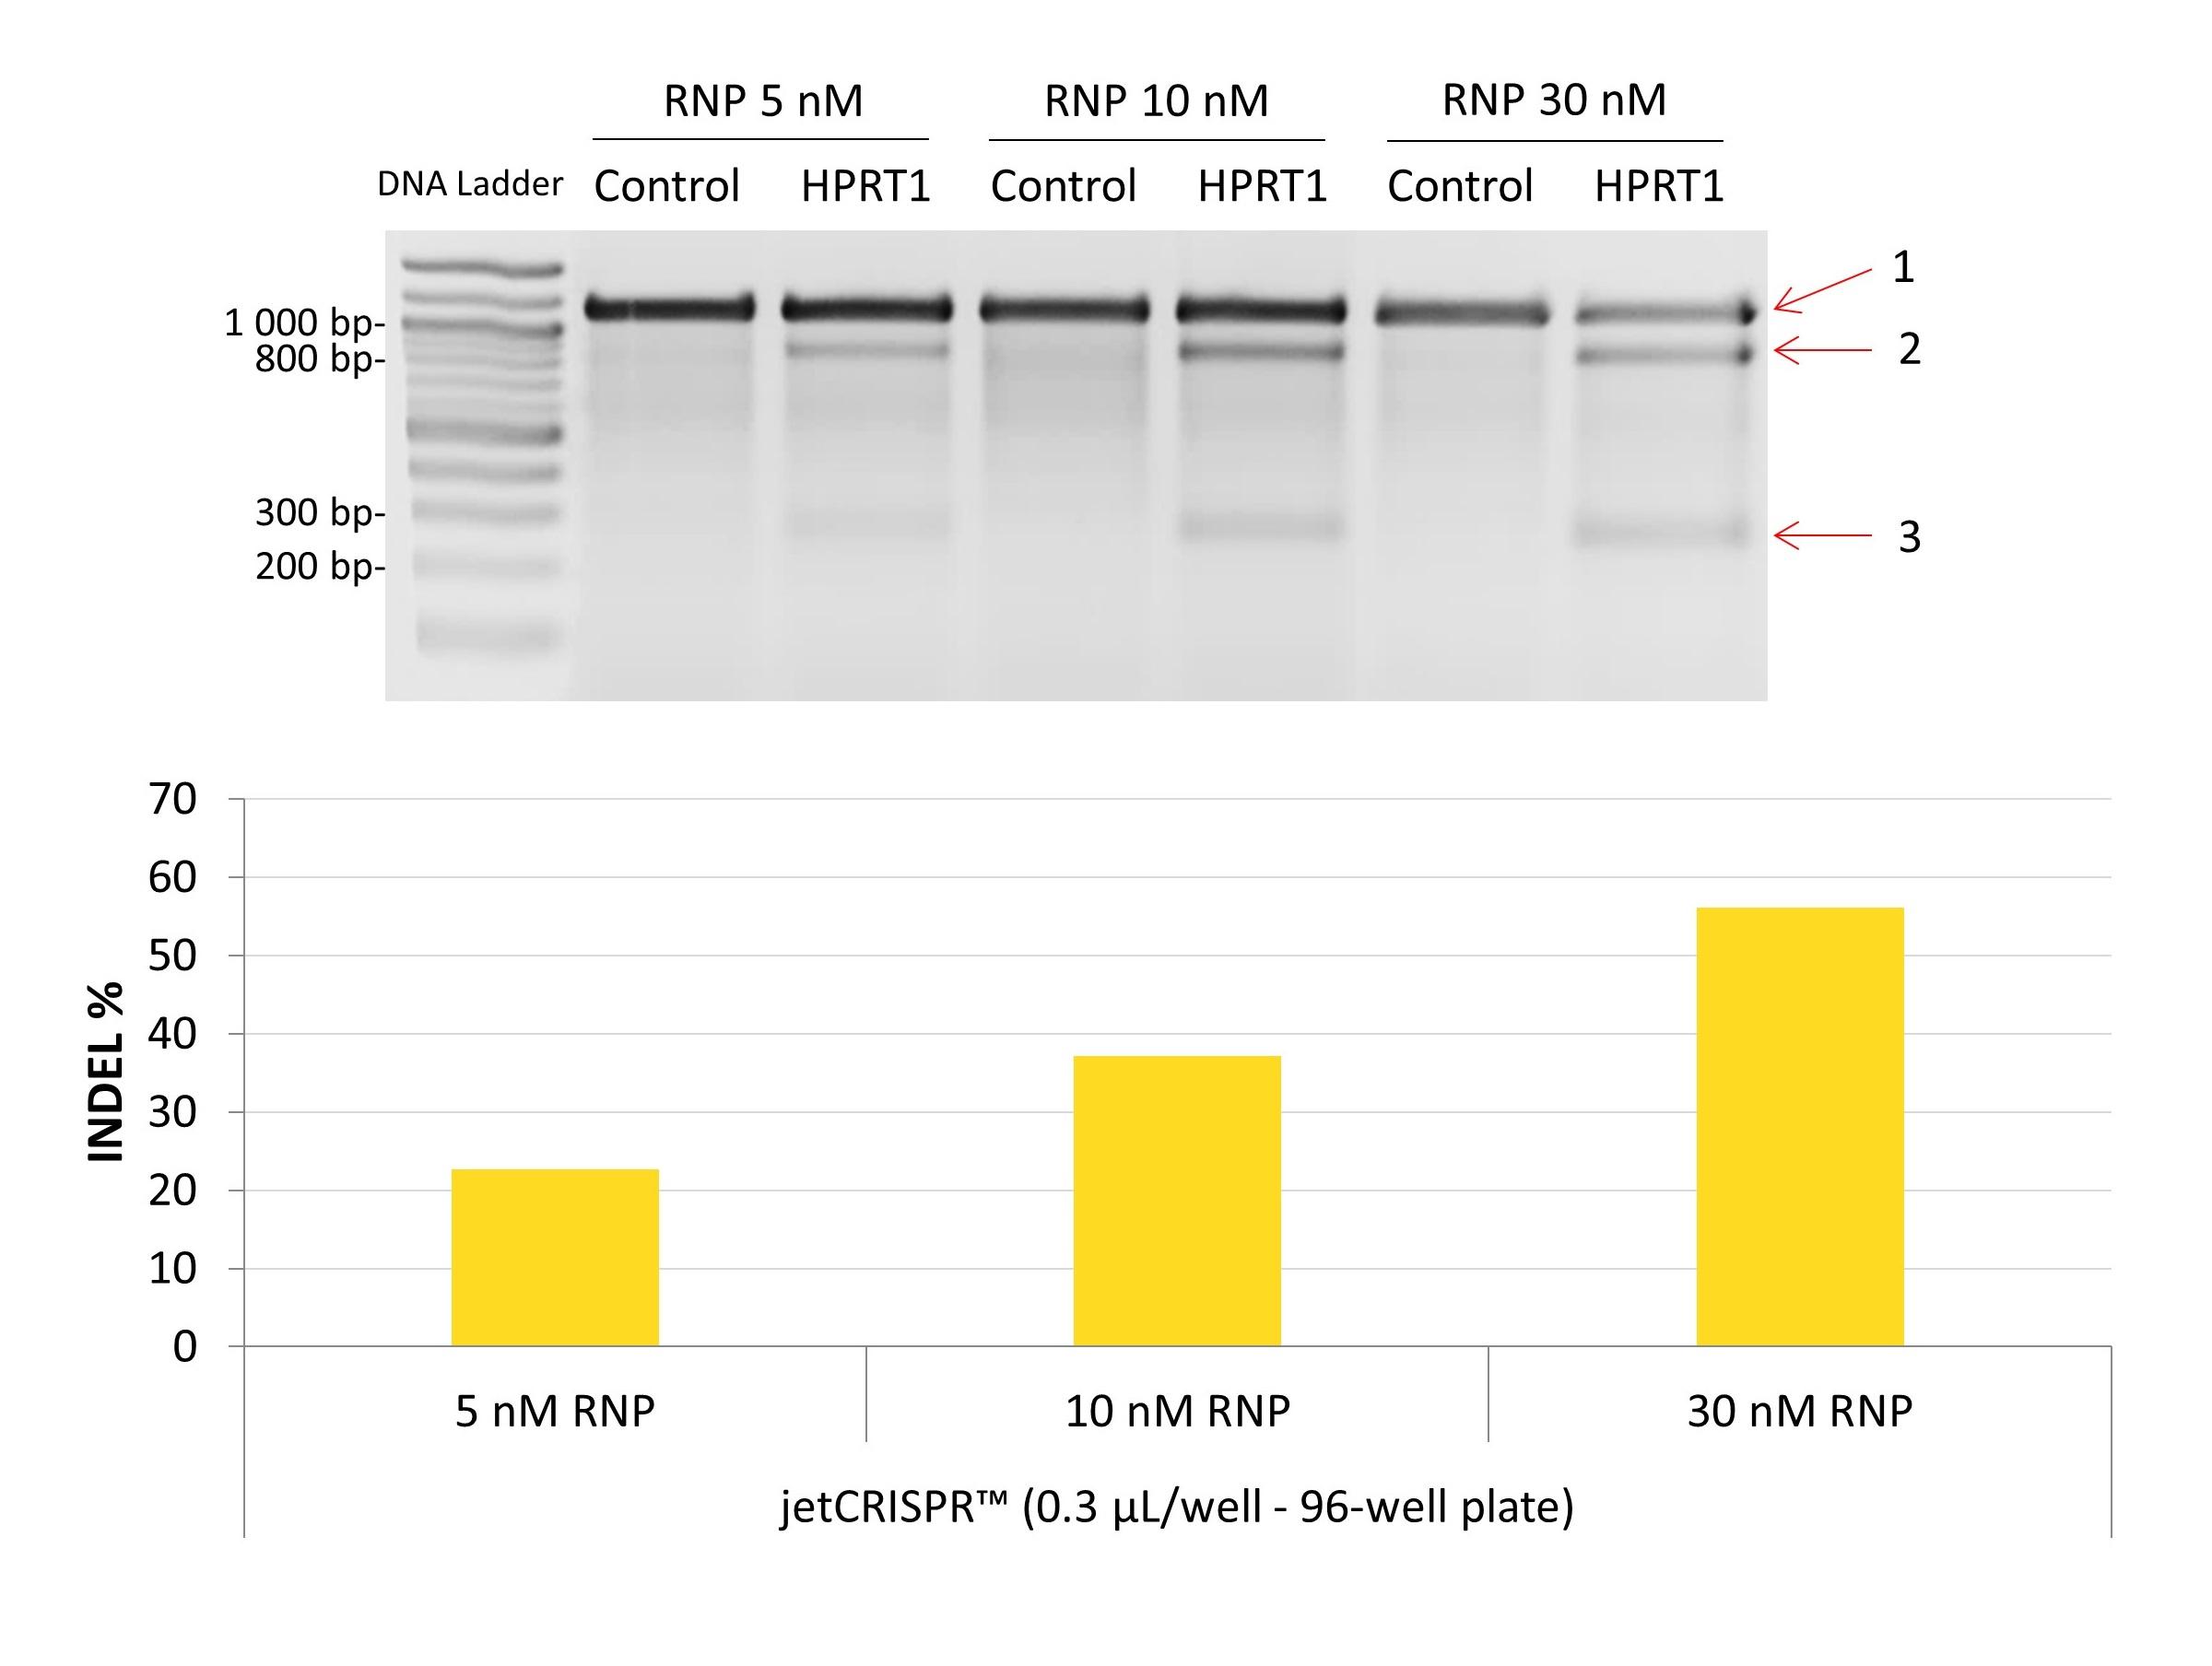 jetCRISPR - Genome editing efficiency